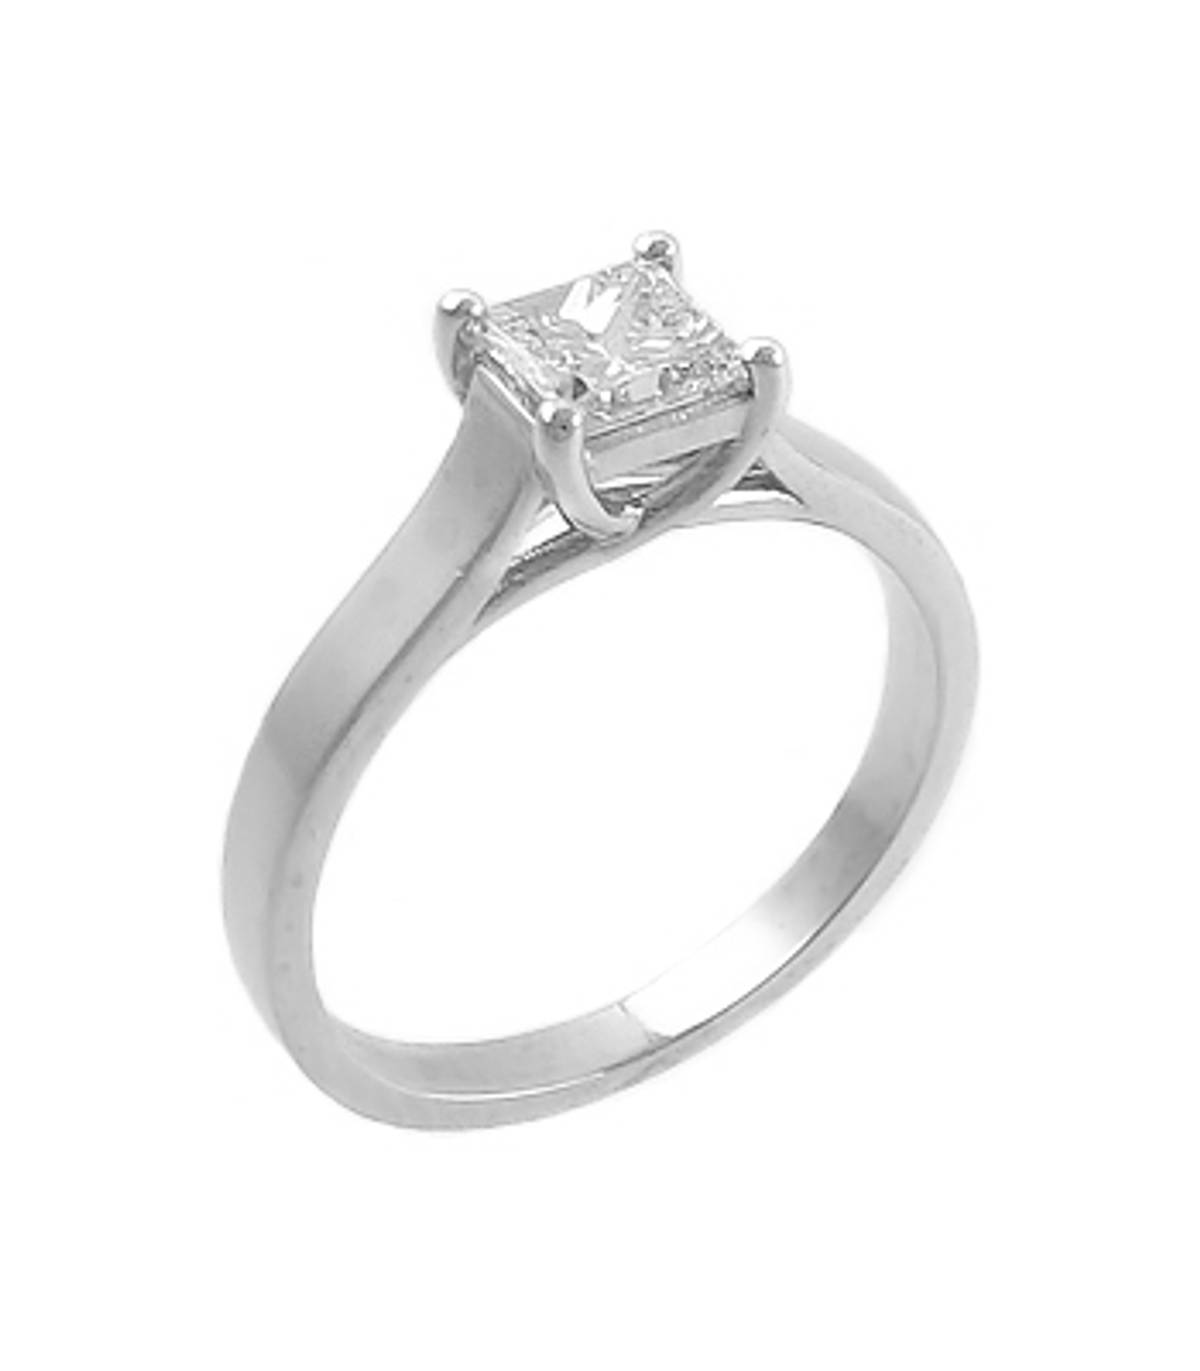 Irish madeprincess cut 0.50ct diamond solitaire ring set in platinum